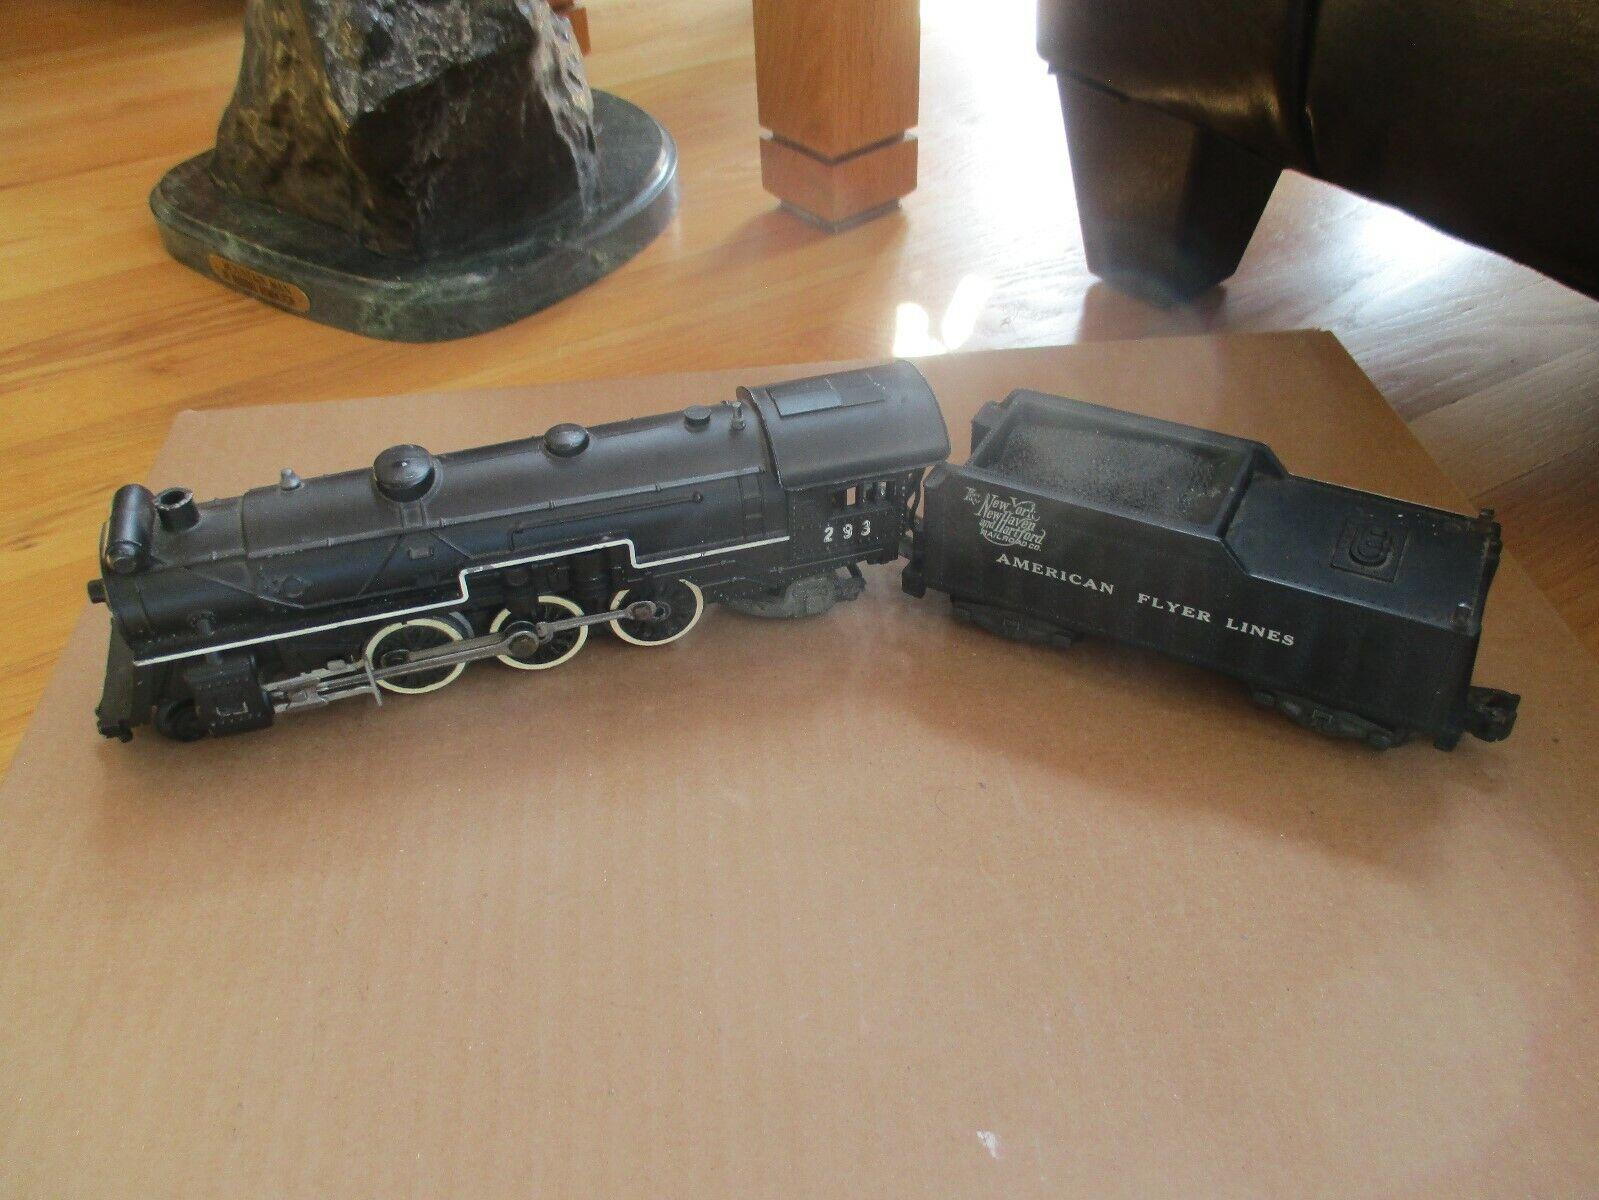 American Flyer 293 steam loco (1 23 19)